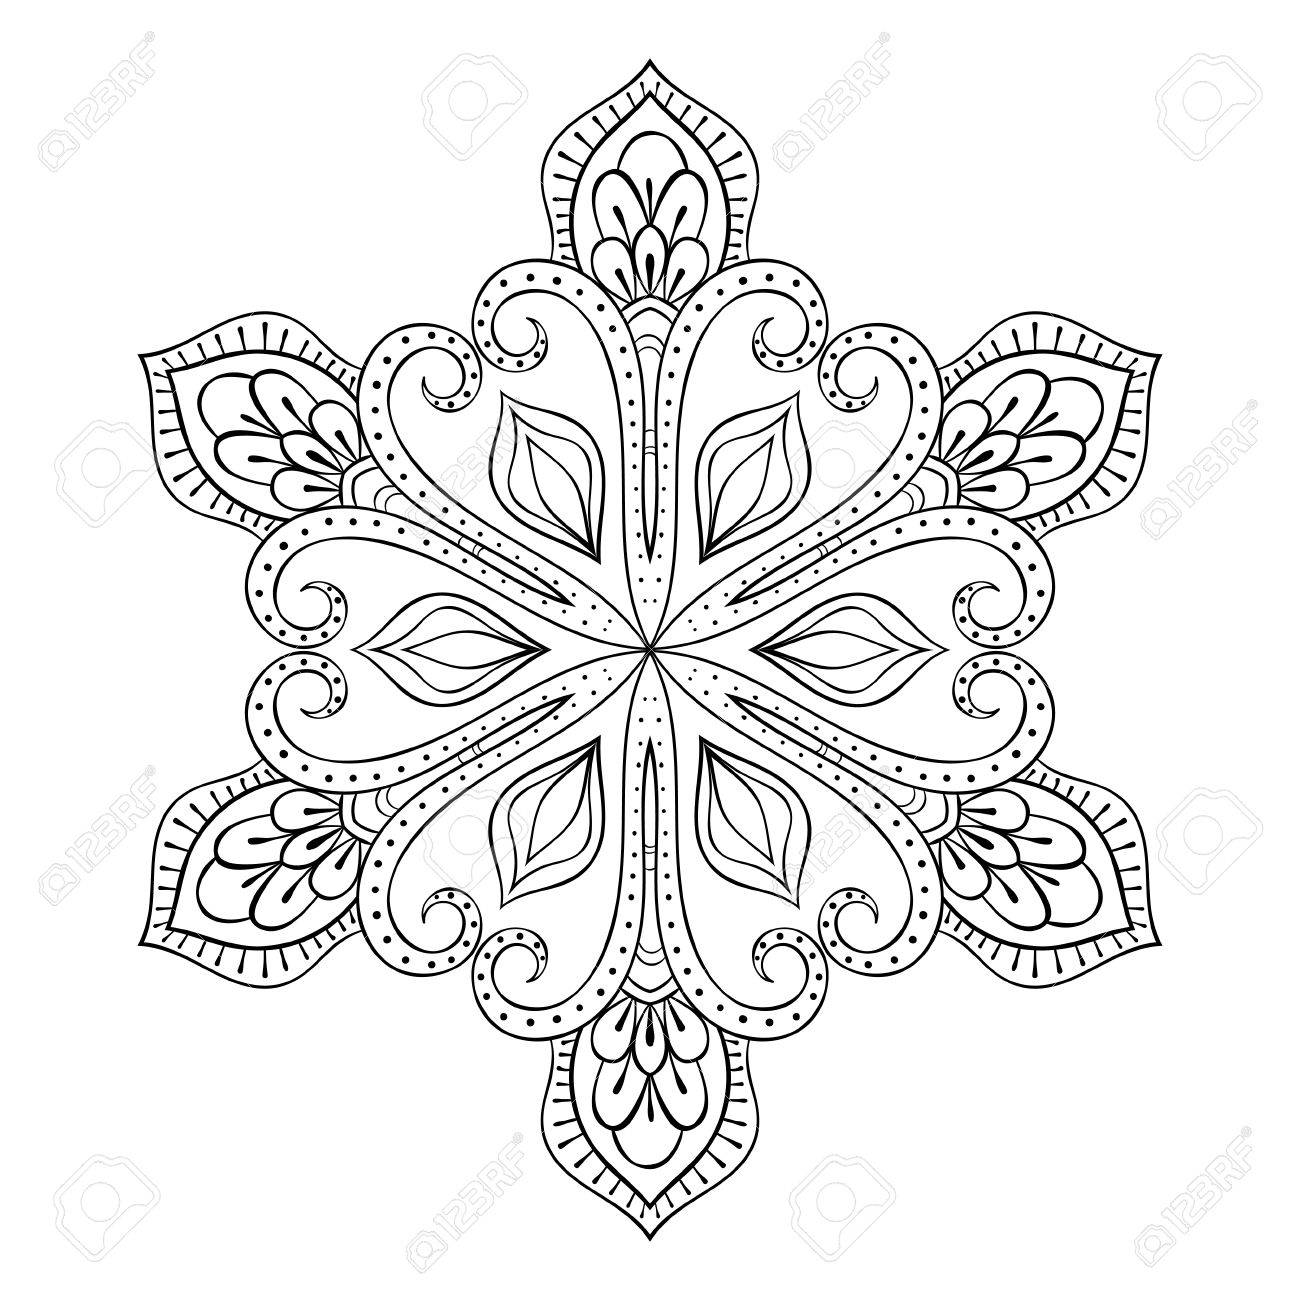 Vector Copo De Nieve En Estilo Zentangle, Doodle Mandala Para ...